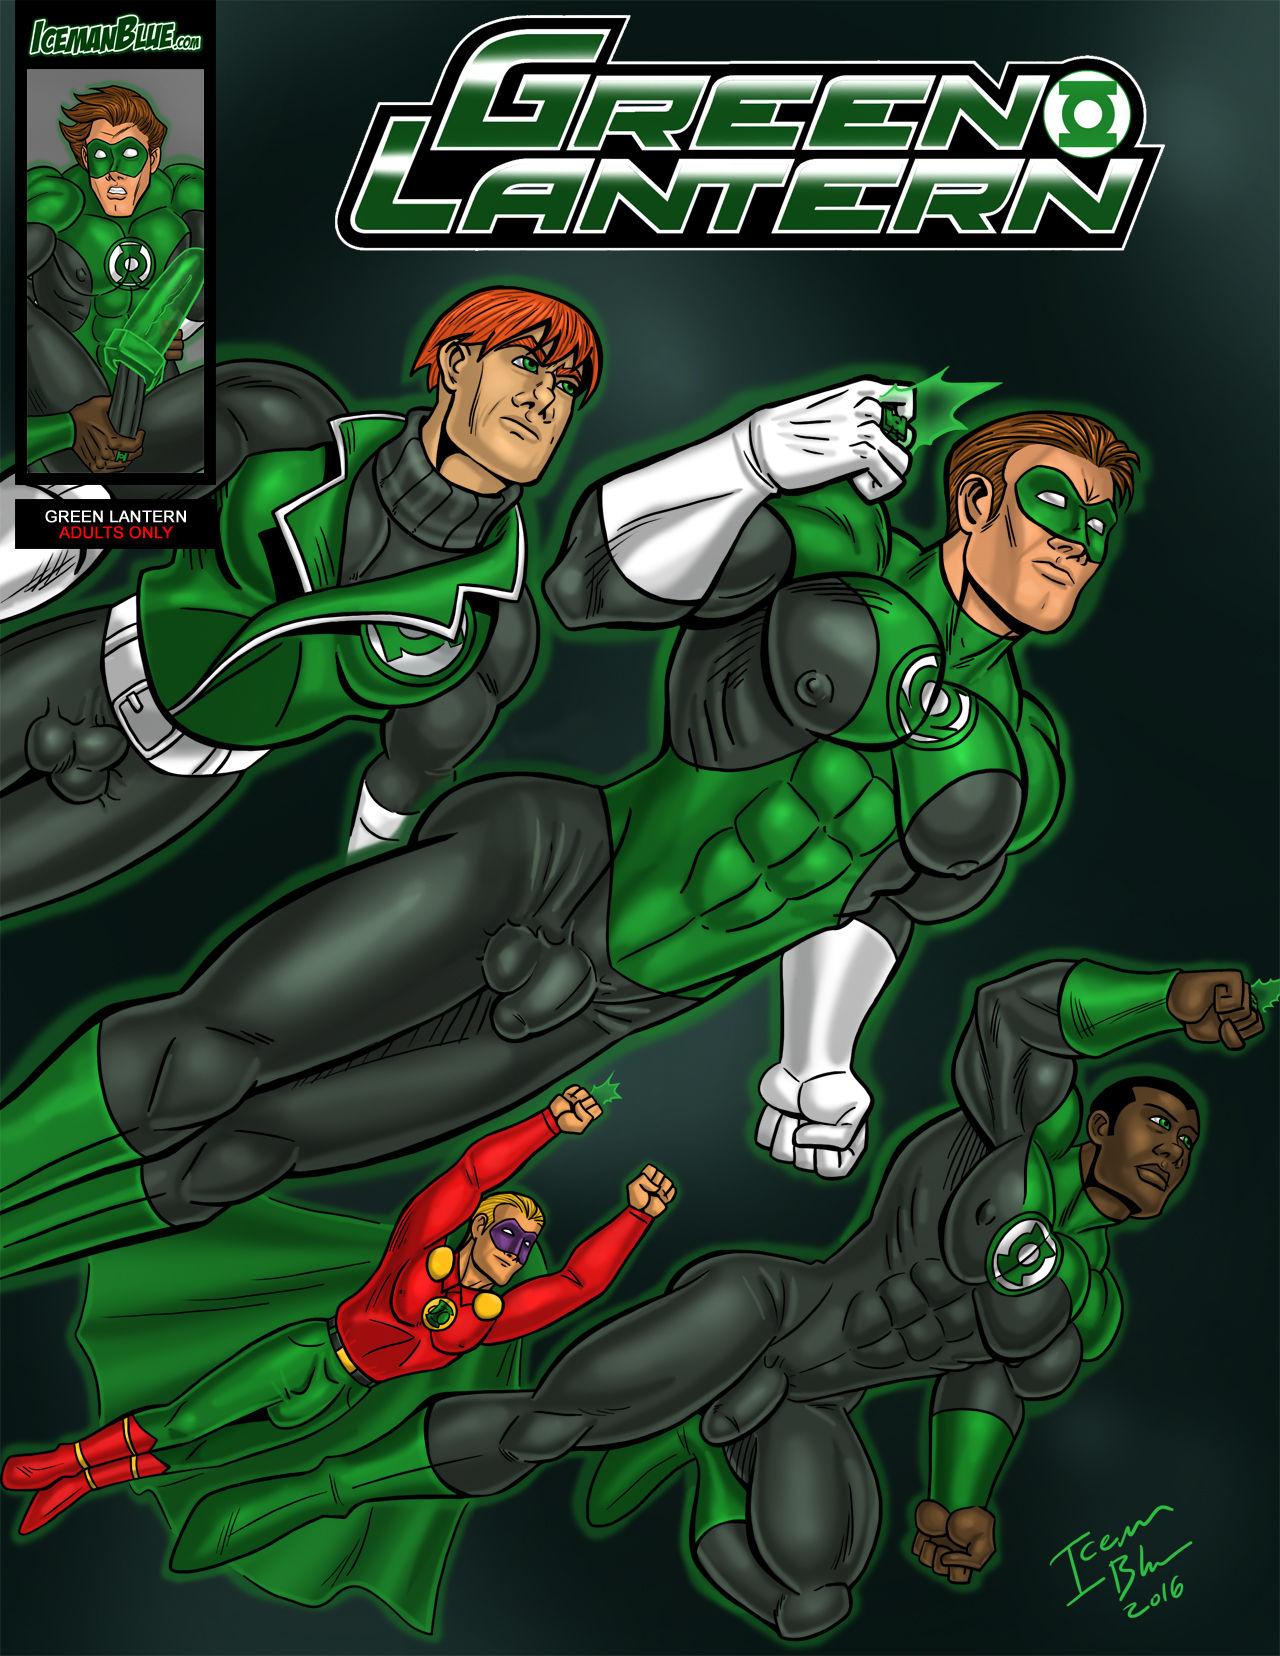 Porn Comics - Green Lantern- Iceman Blue porn comics 8 muses